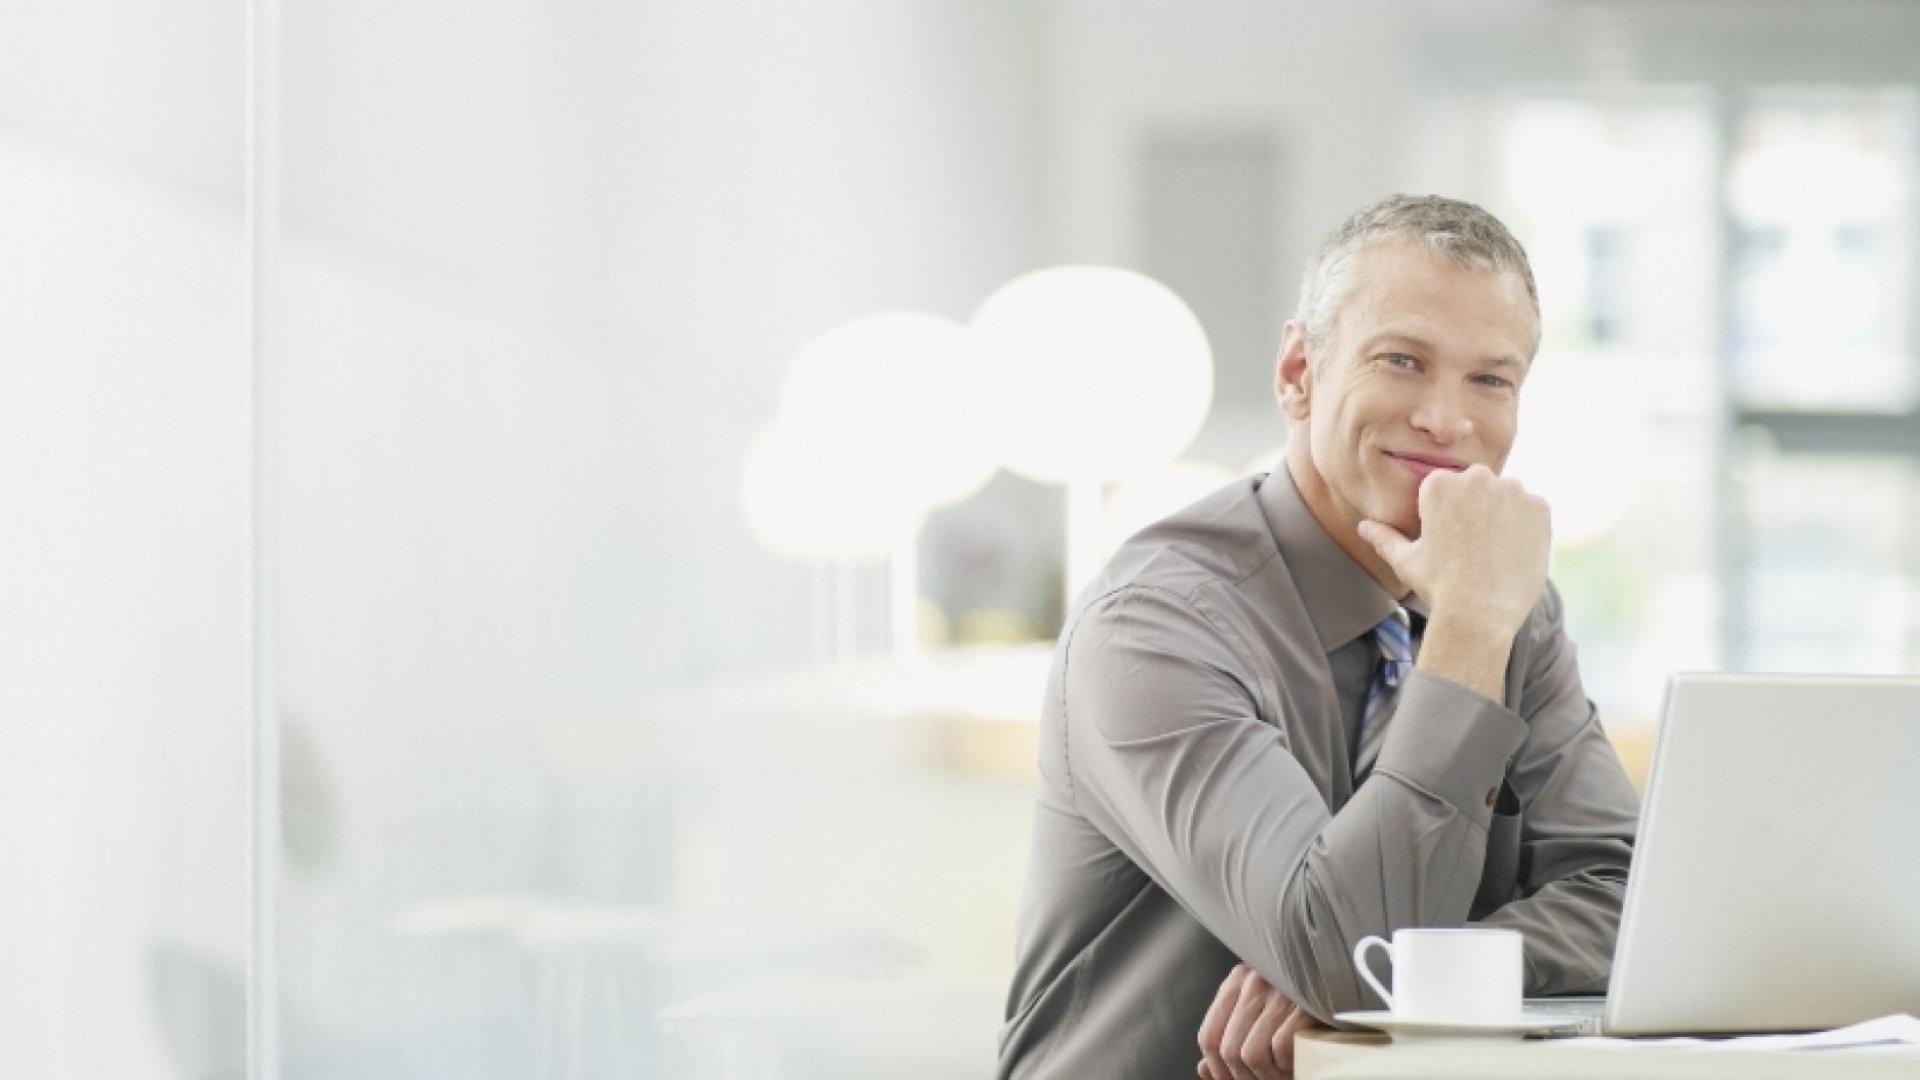 3 Guaranteed Ways to Build More Entrepreneurial Courage